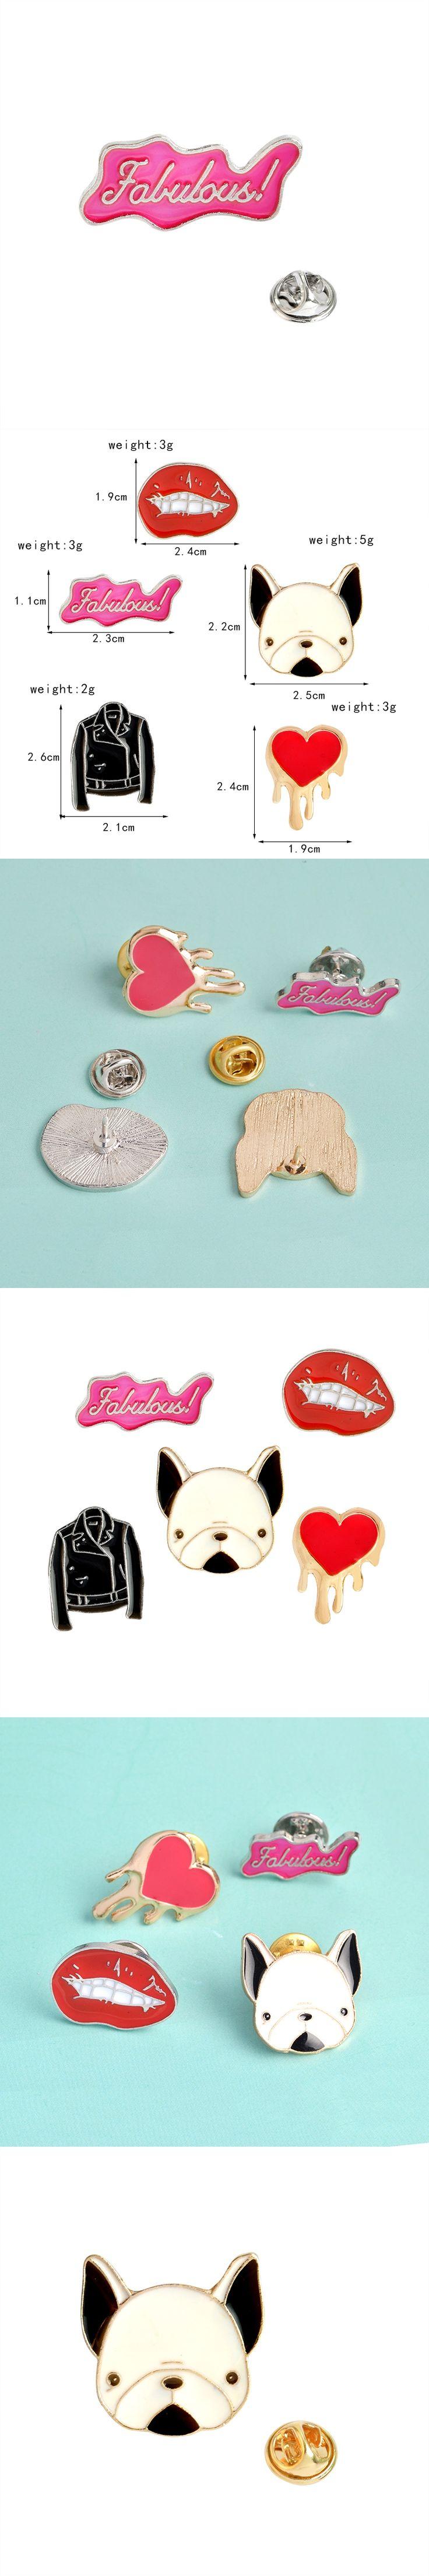 Cartoon Fabulous PU Jacket Red Lip Heart French Bulldog Brooch Button Pins Brooch Denim Jacket Pin Badge Gift Fashion Jewelry